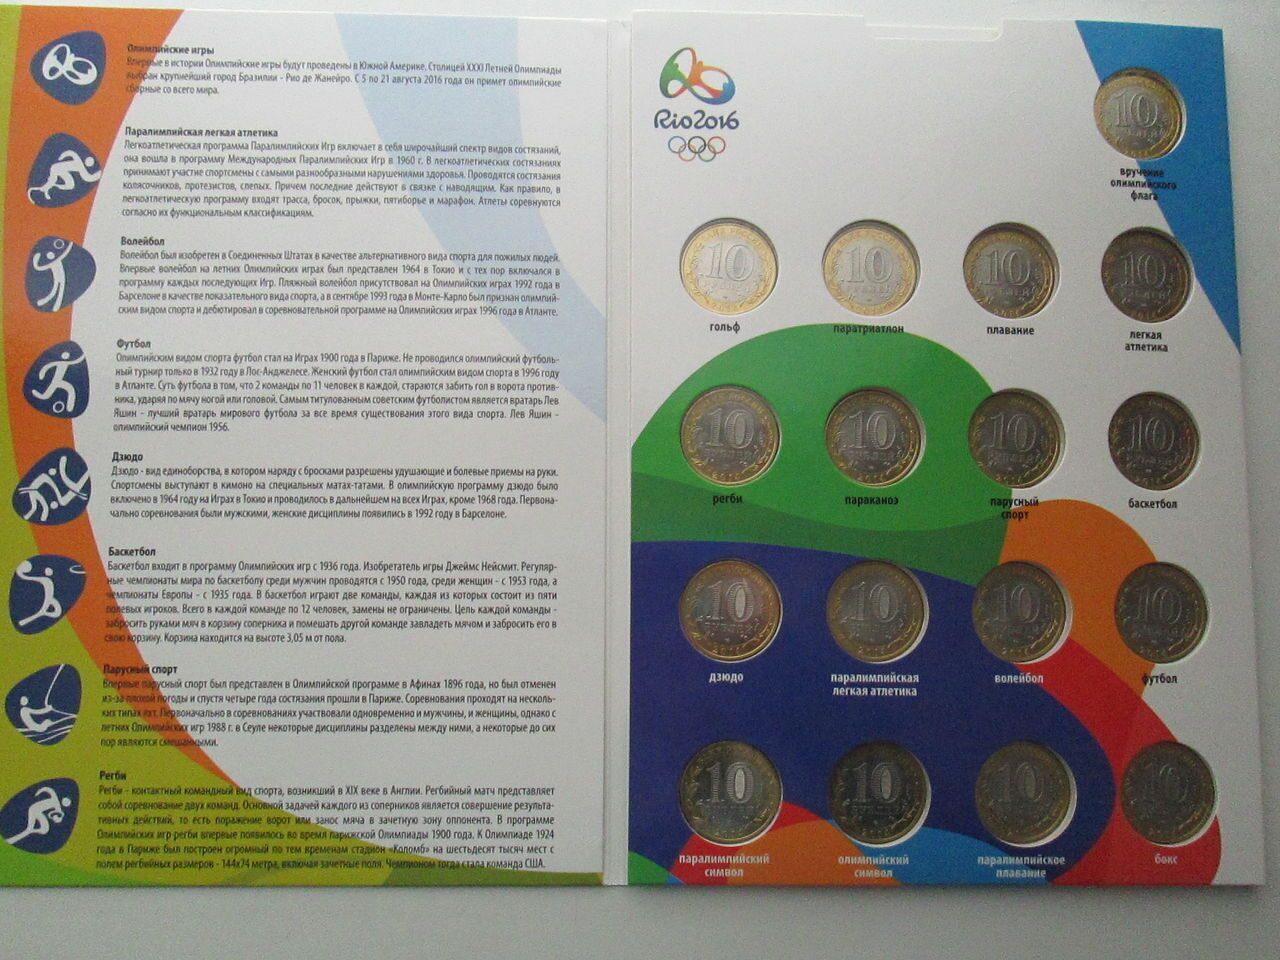 Памятный альбом олимпиада 2014 книга сапсан